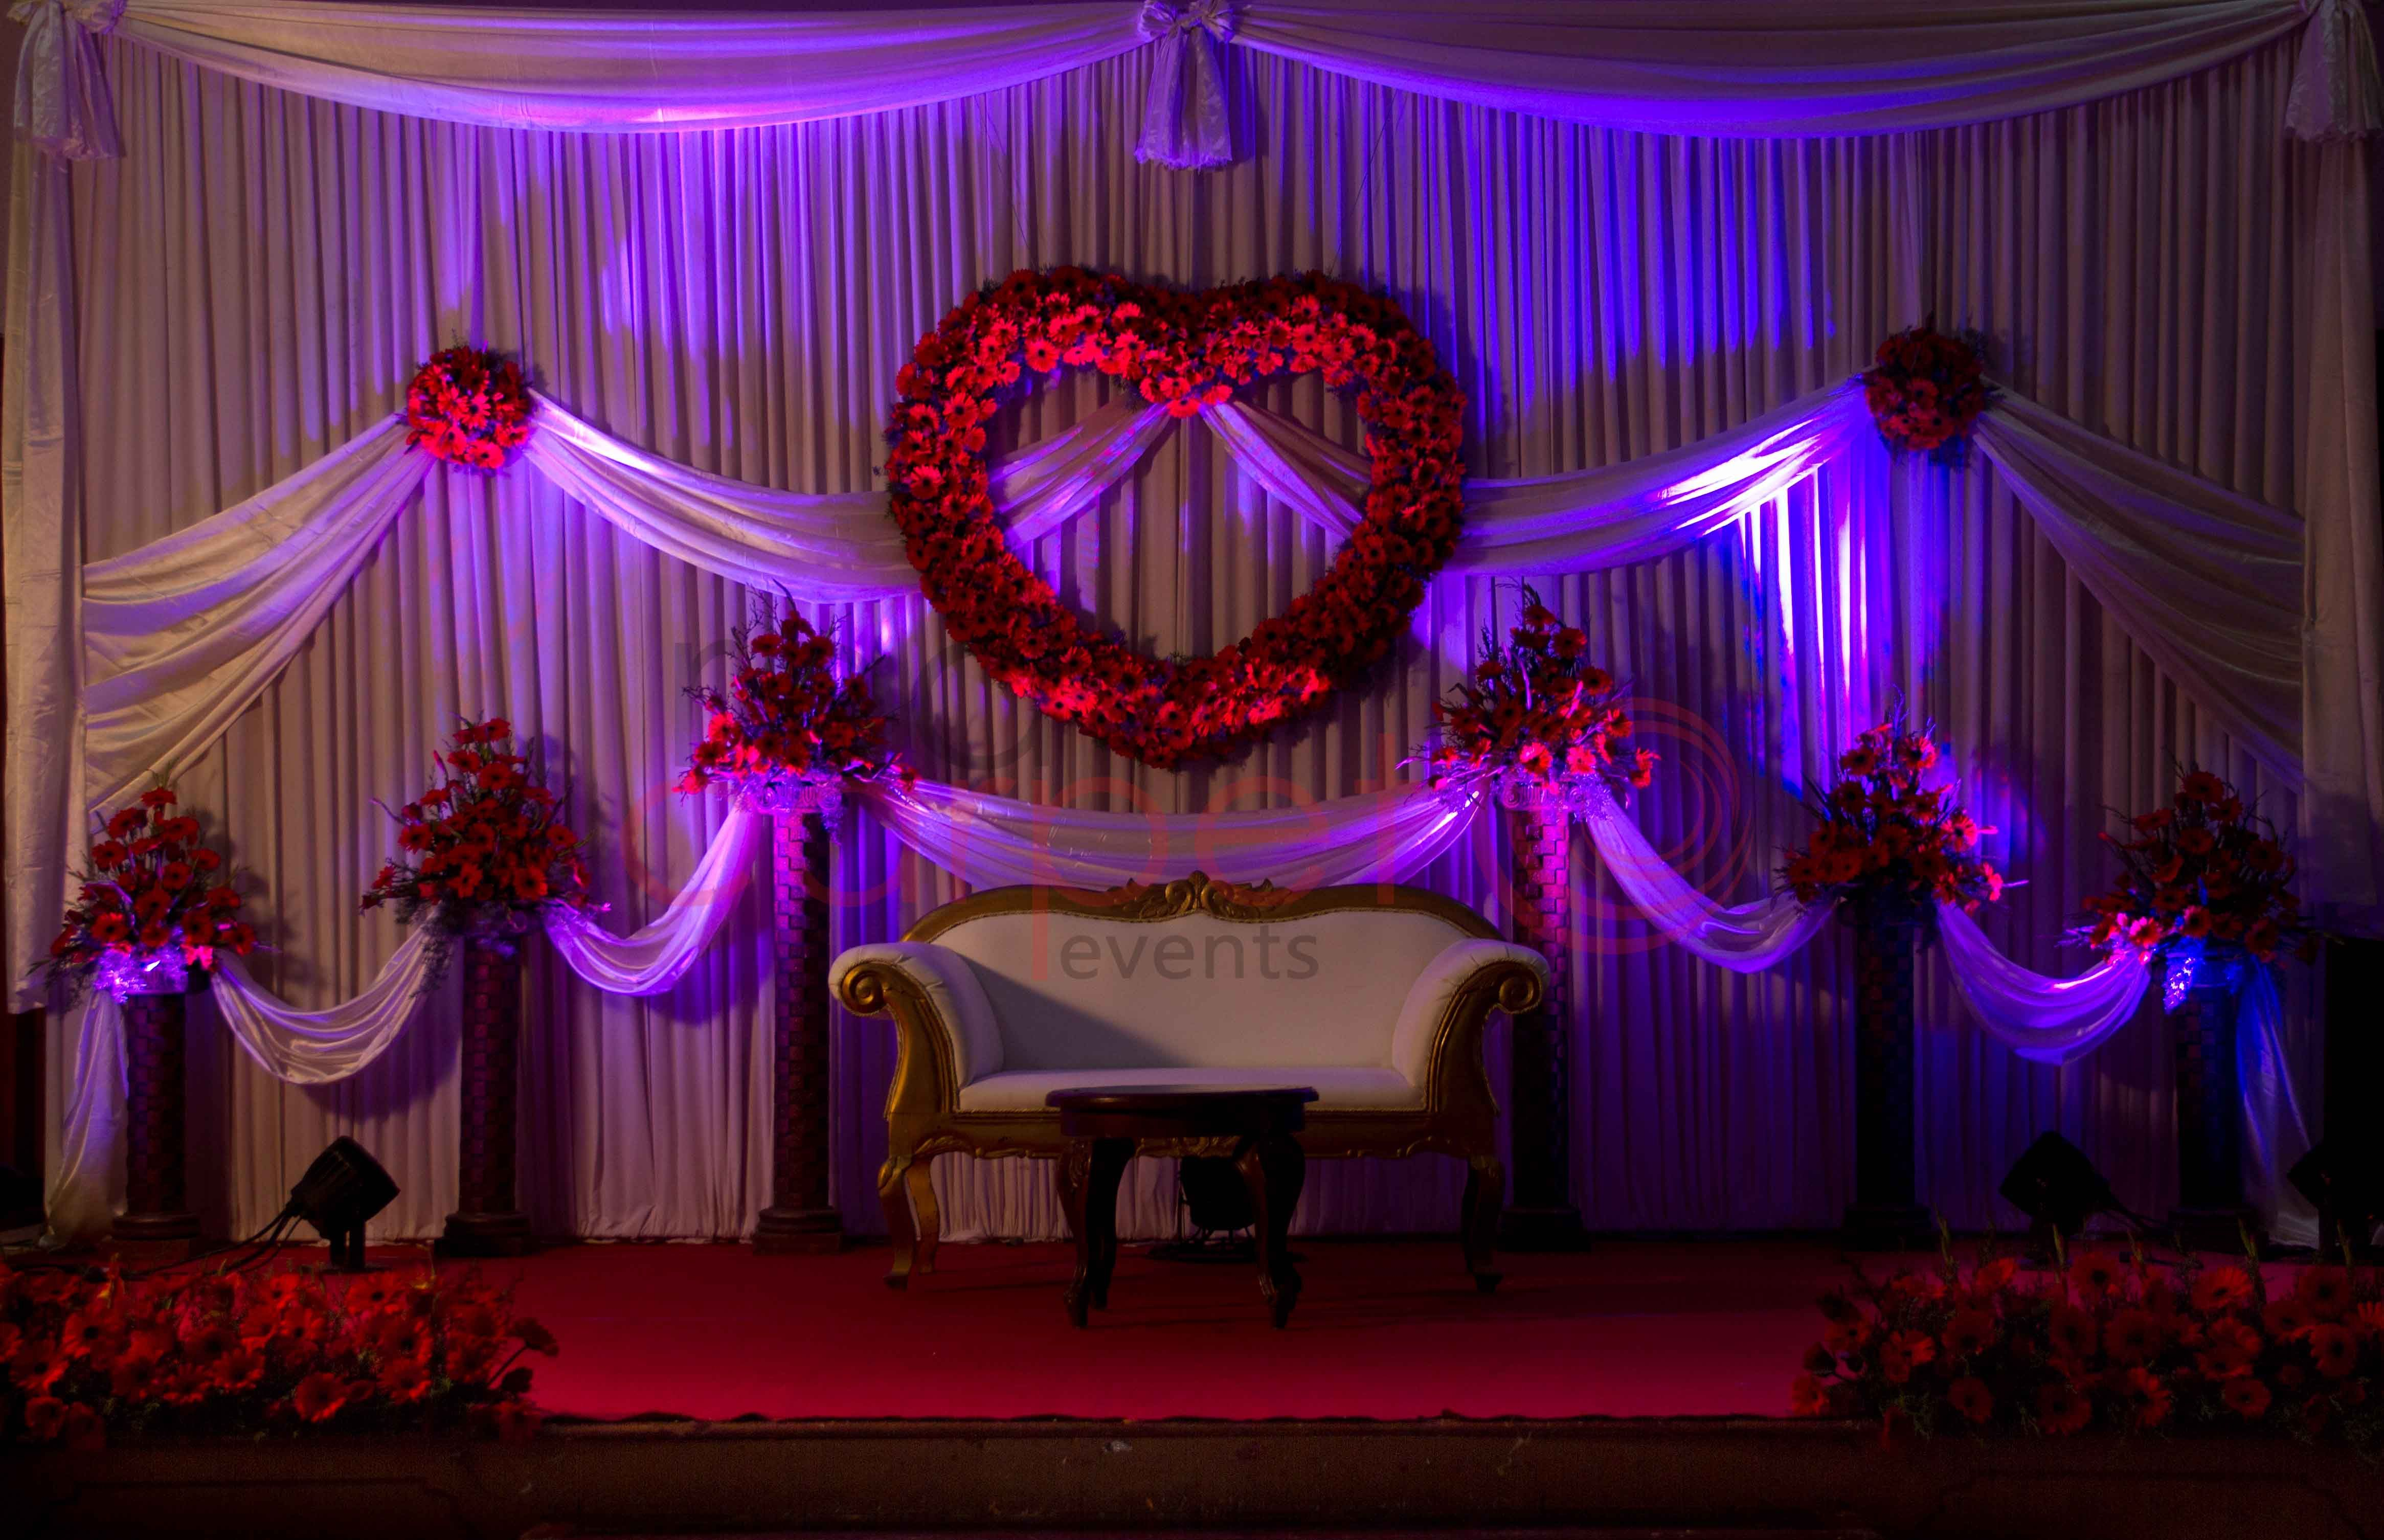 Valentine theme wedding decor banquet idear pinterest valentine theme wedding decor junglespirit Images